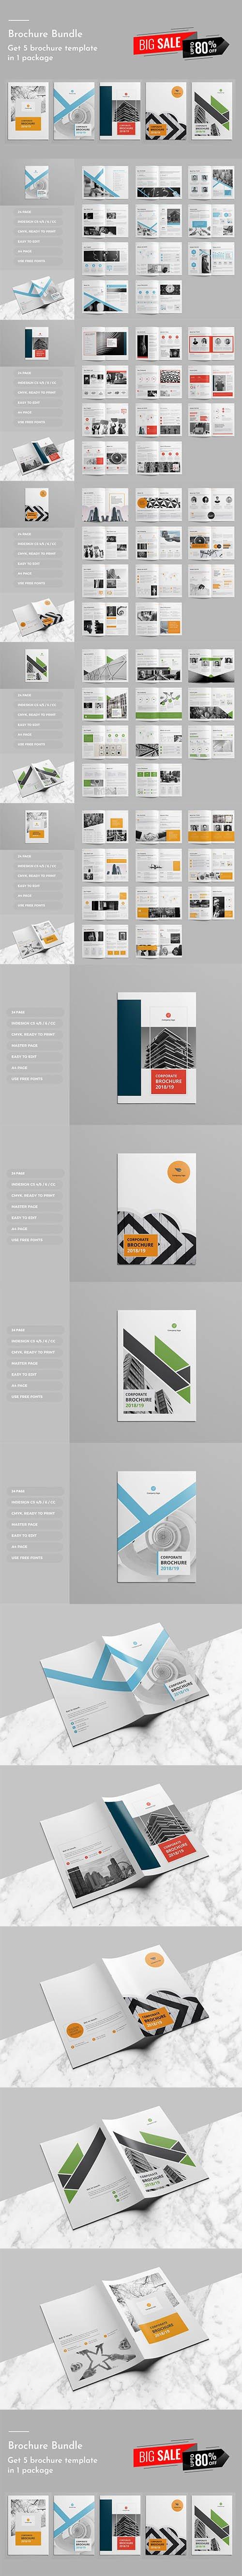 CreativeMarket - Corporate Brochure Bundle 4213030